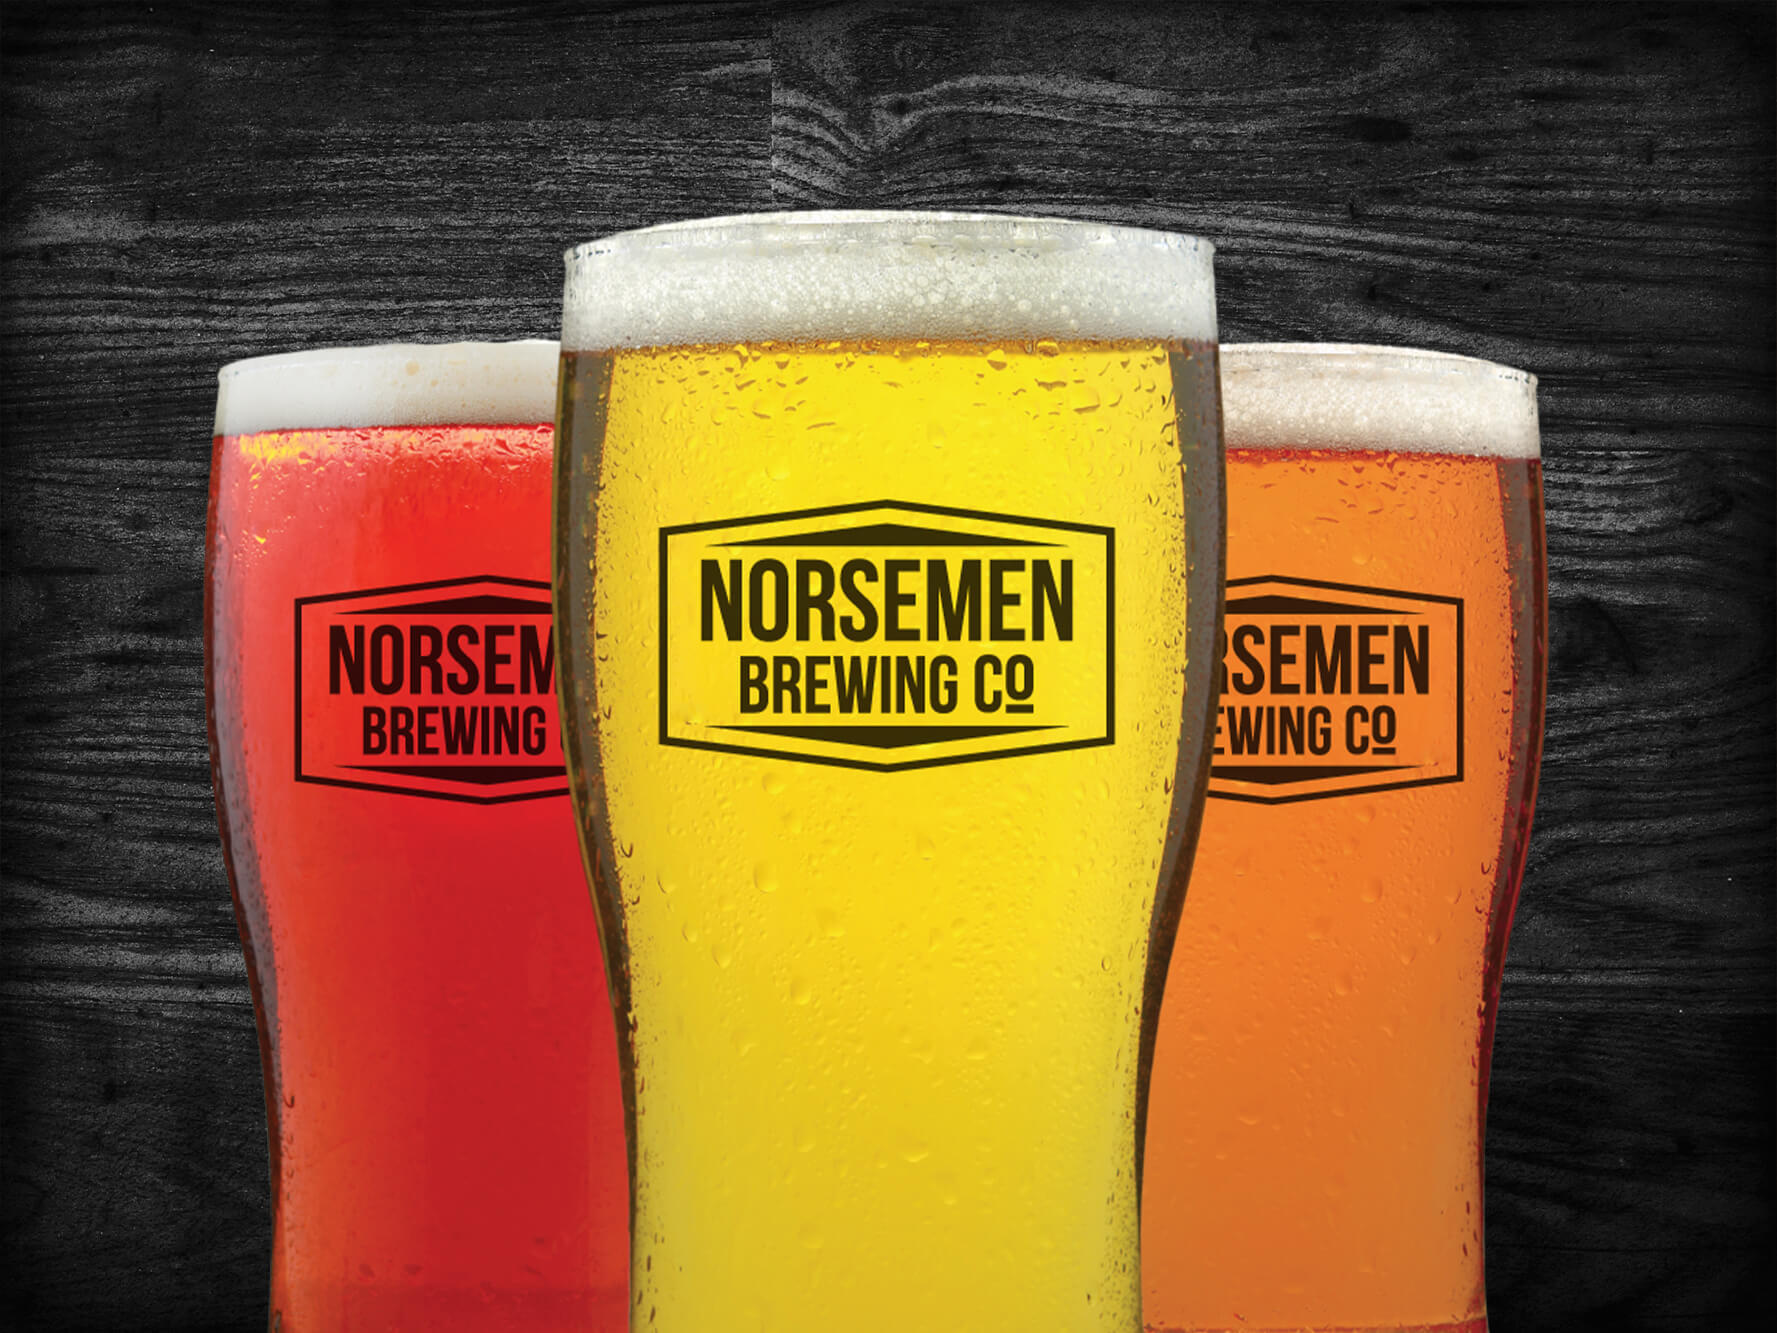 norsemen brewing co logo on three beer mugs